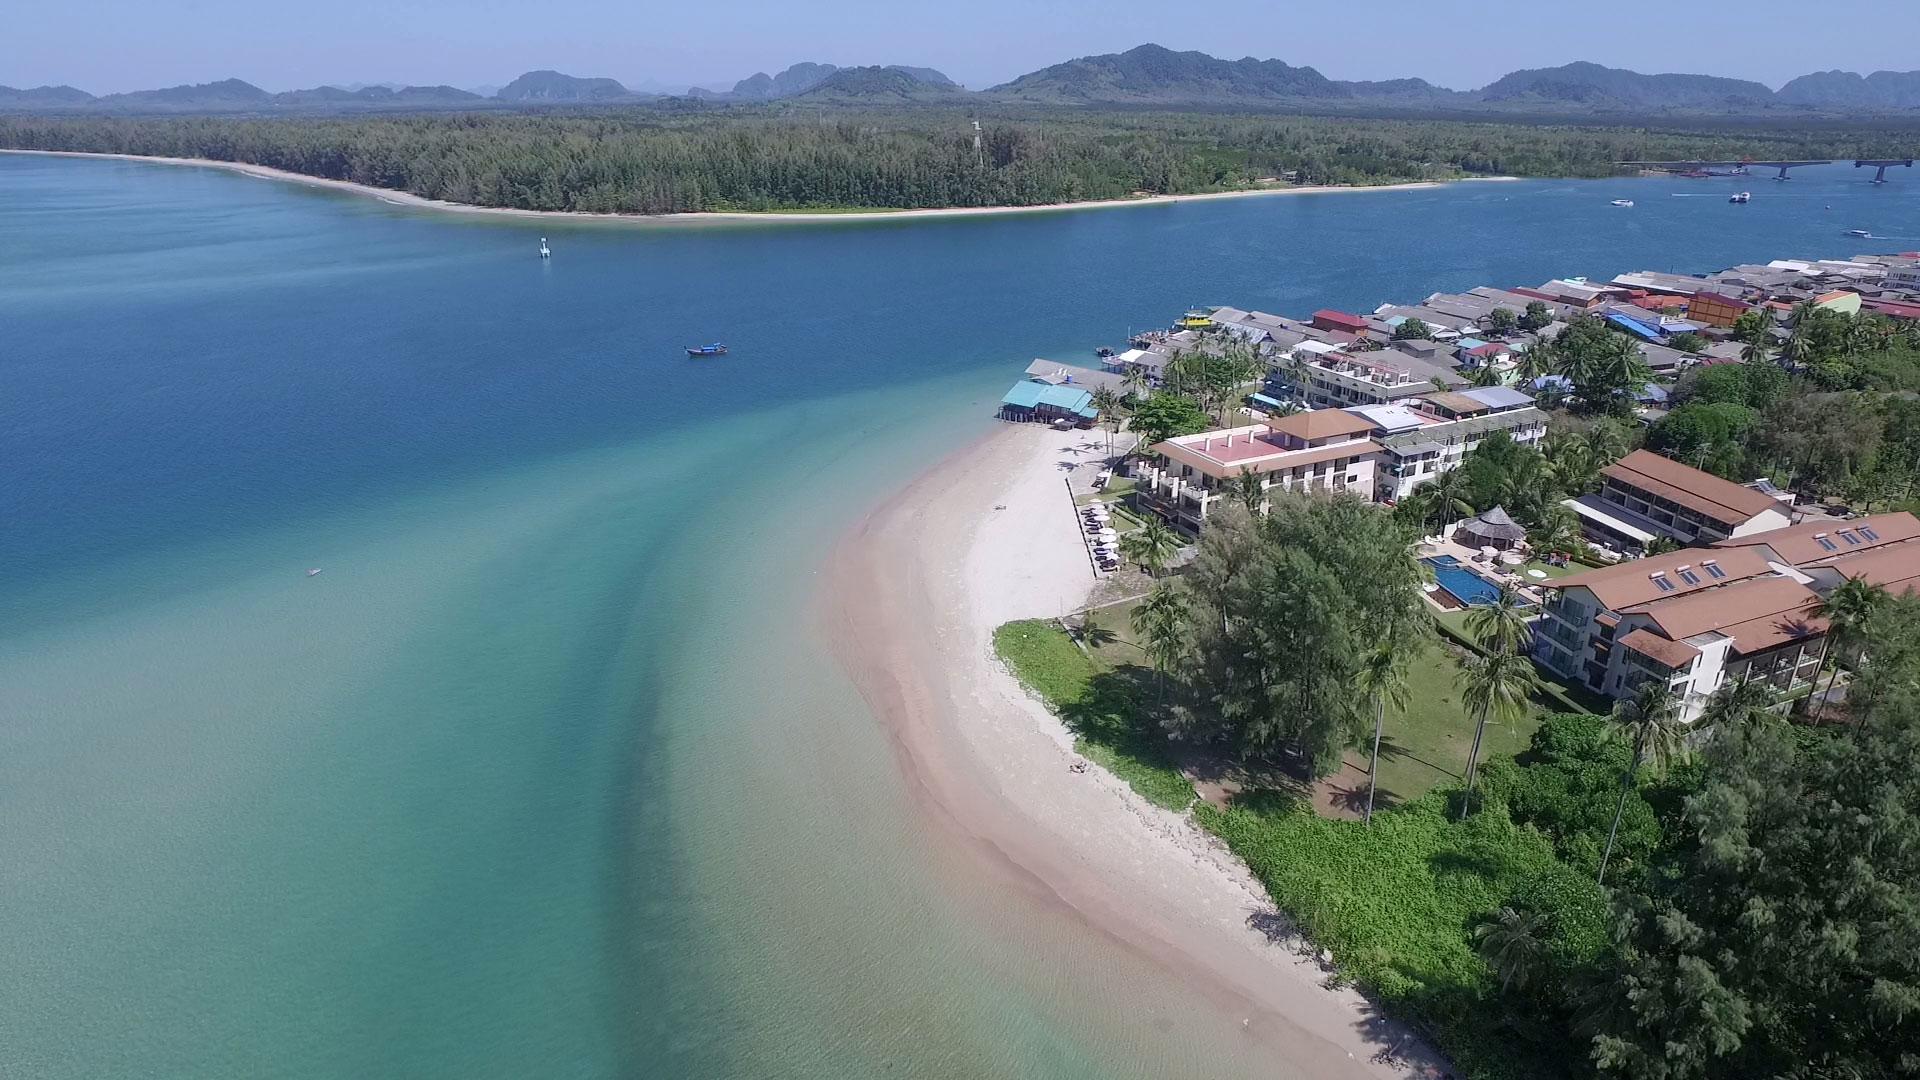 Pura Resort 4 2016